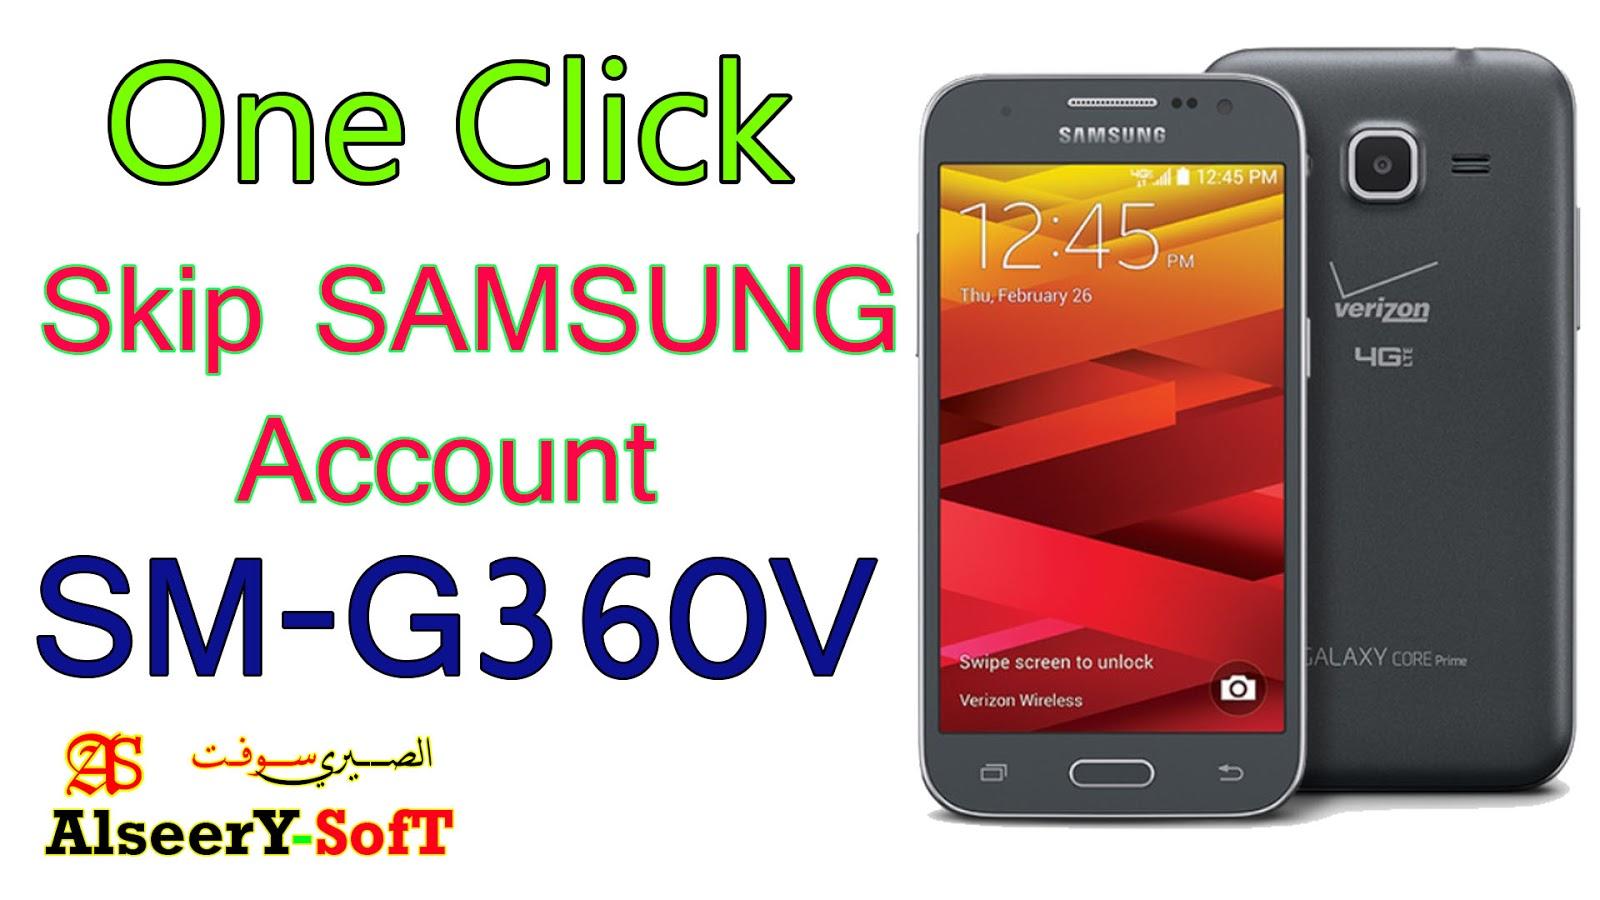 Bypass samsung account SM-G360V One Click